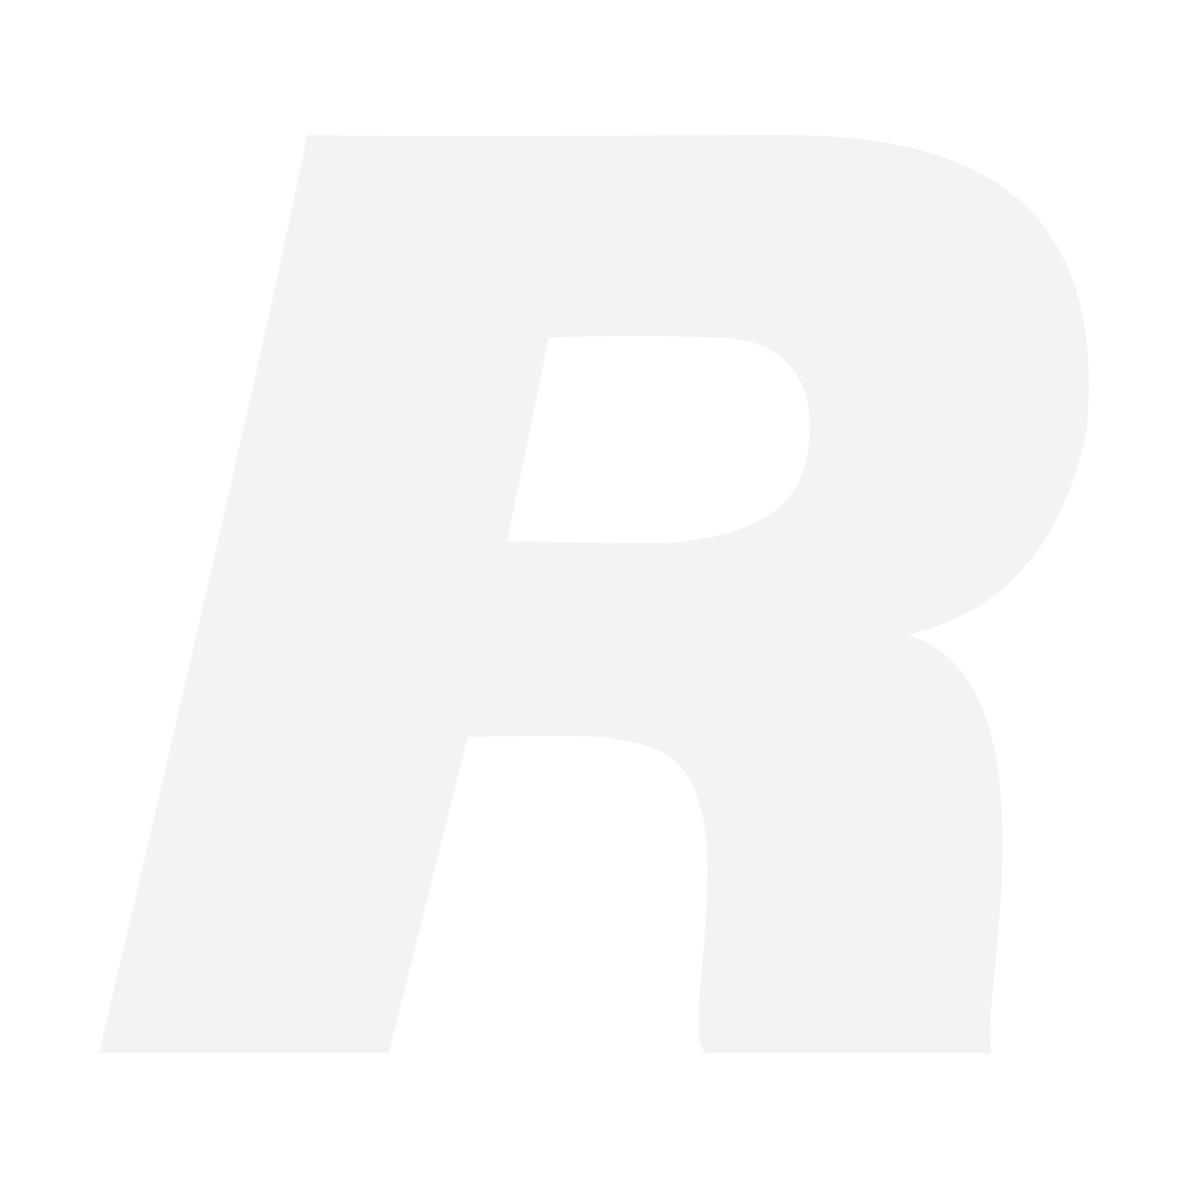 Godox Reemix 3-in-1 Remote Control N1 (Nikon)